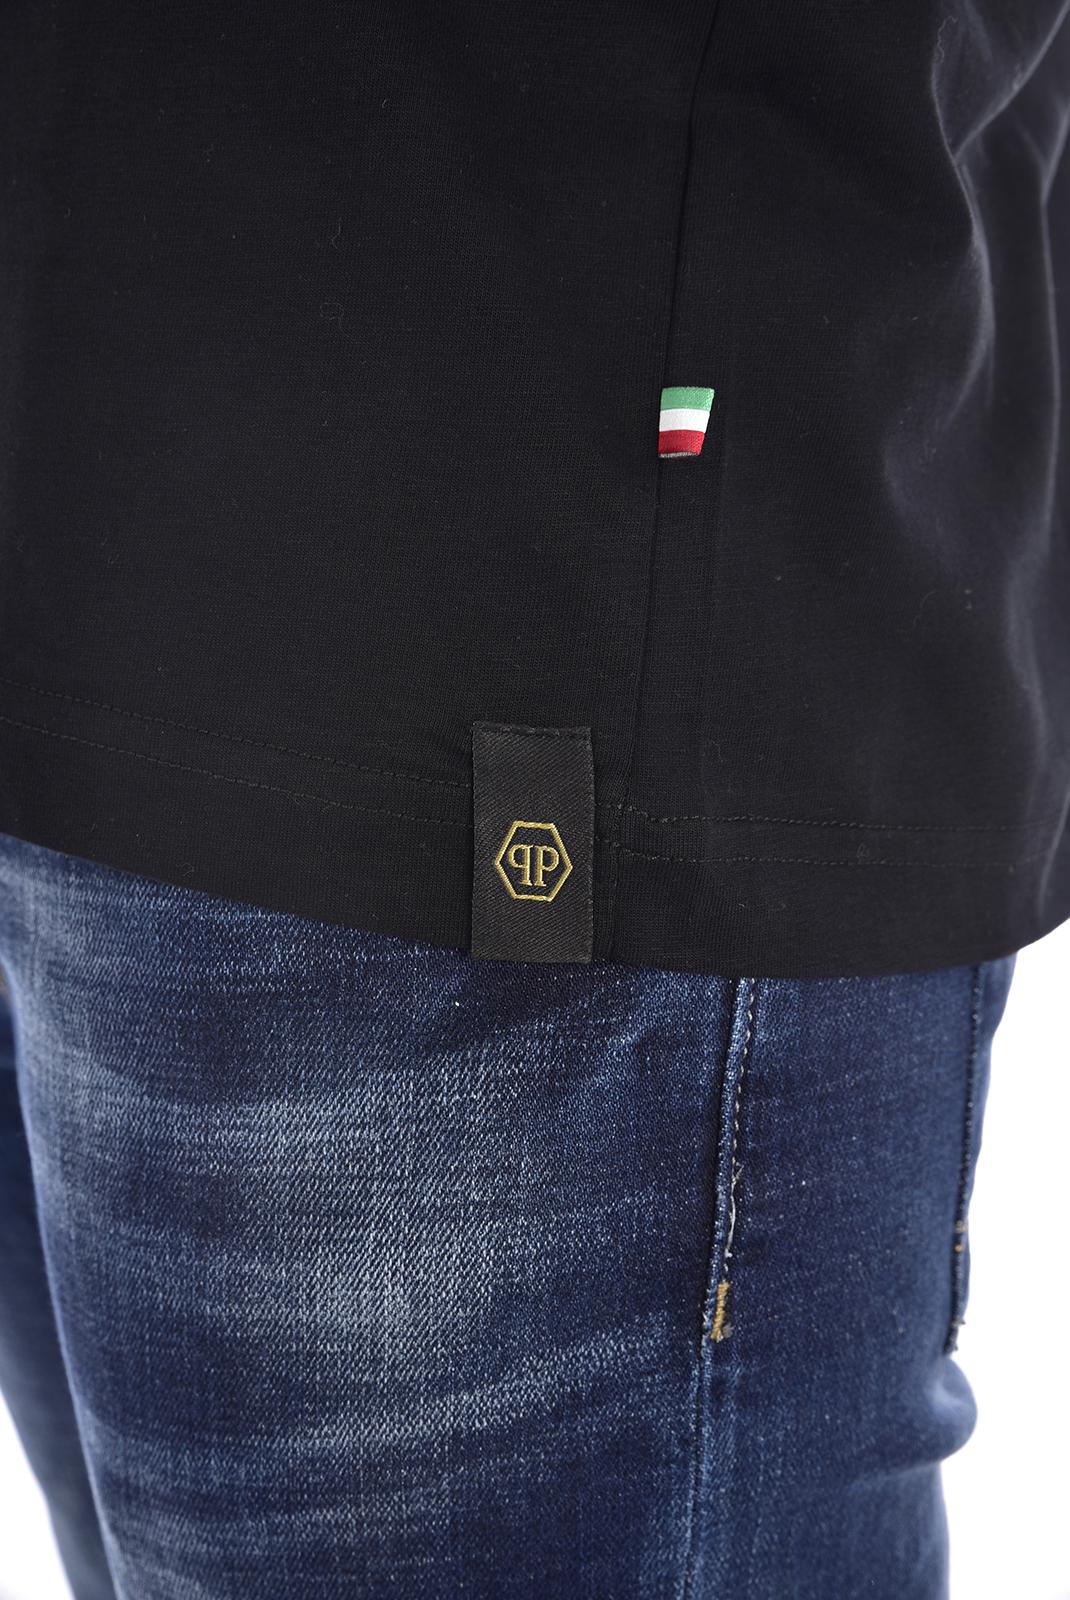 Tee-shirts  Philipp plein MTK2367 GOLD CUT ROUND NECK SS SIGN BLACK/SILVER